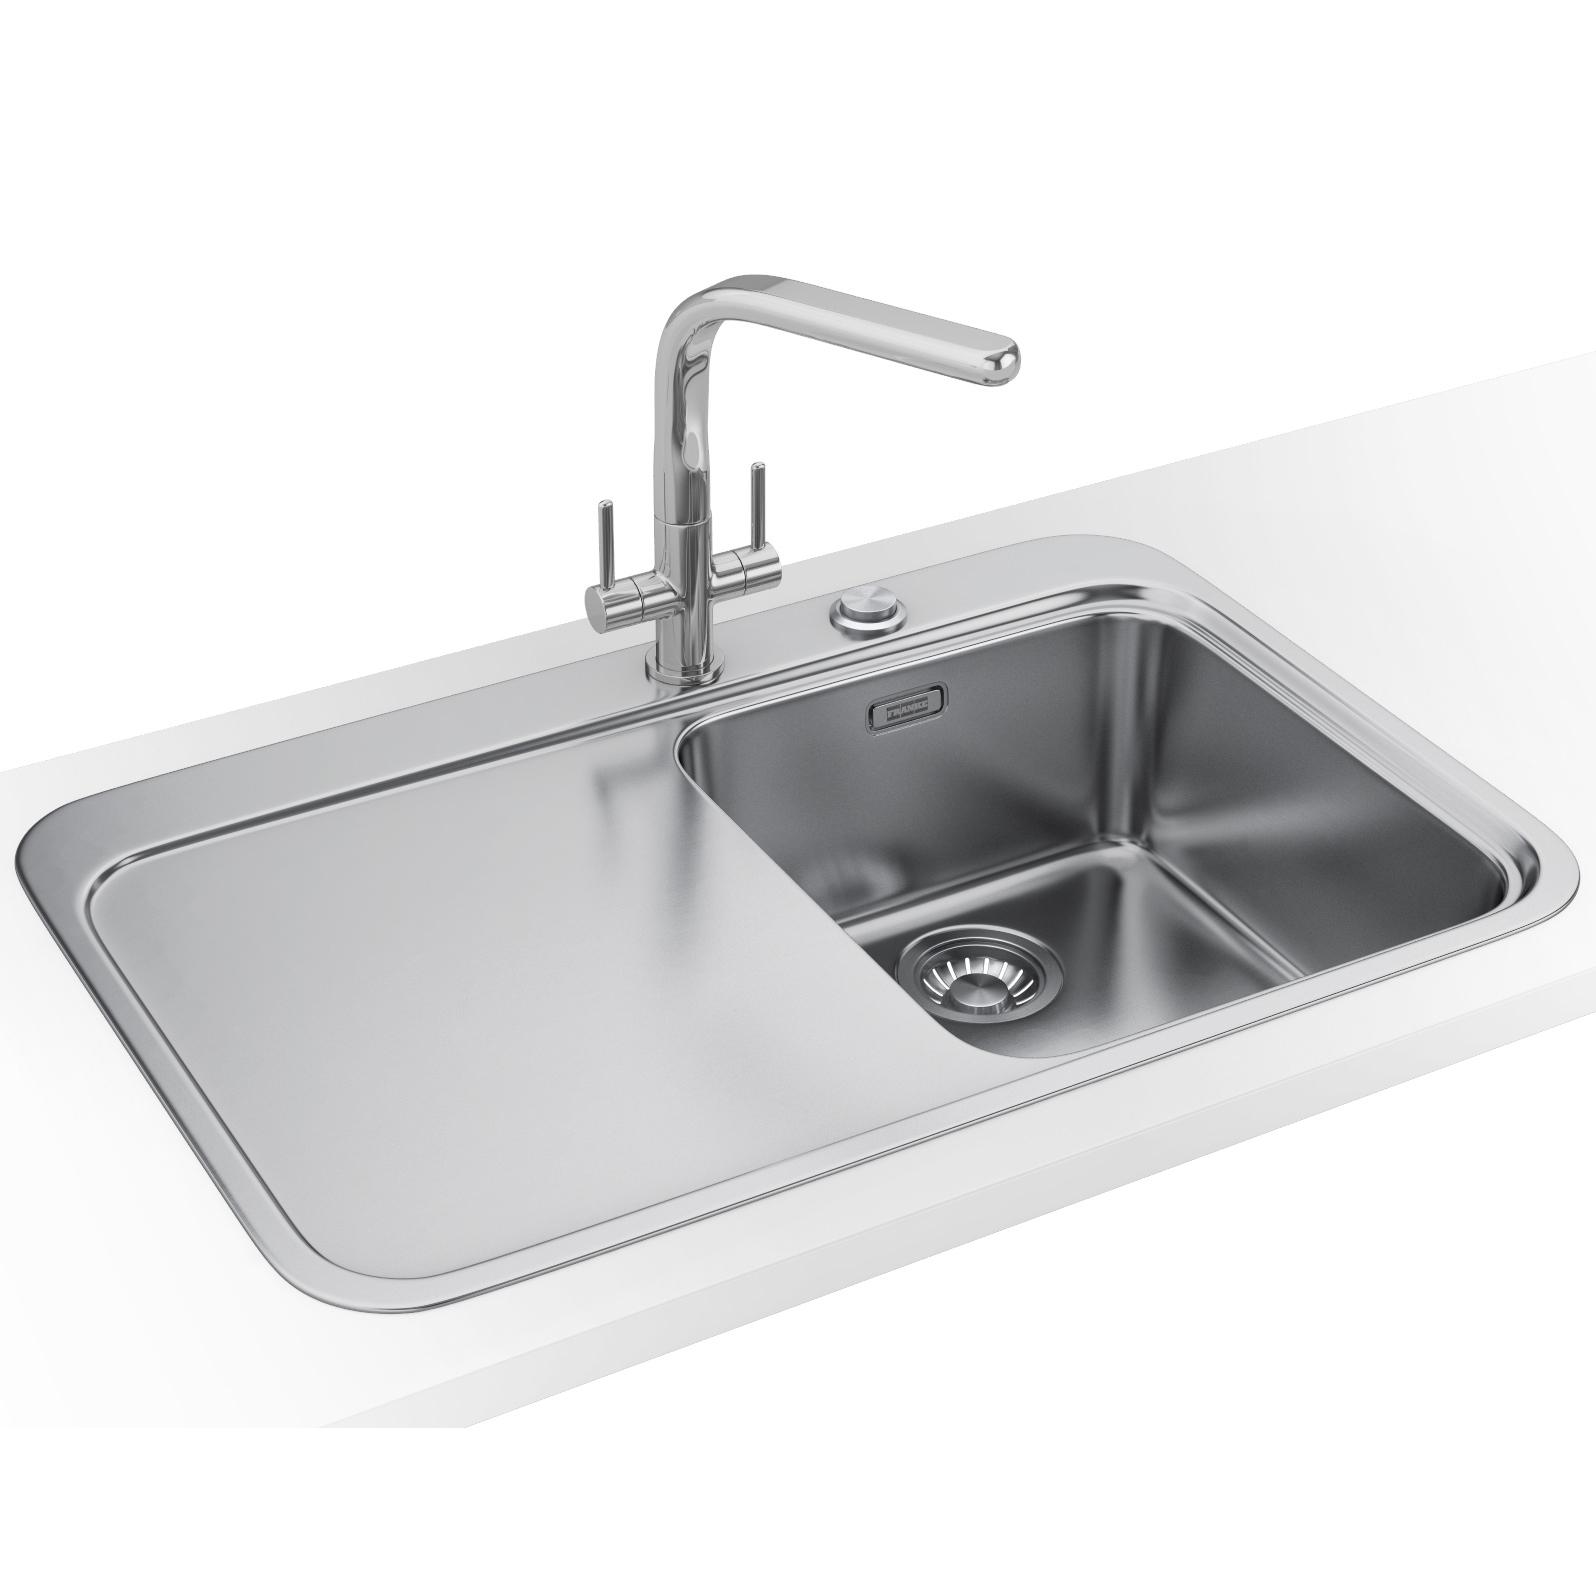 franke sinos snx 211 stainless steel left hand drainer 10 bowl inset sink